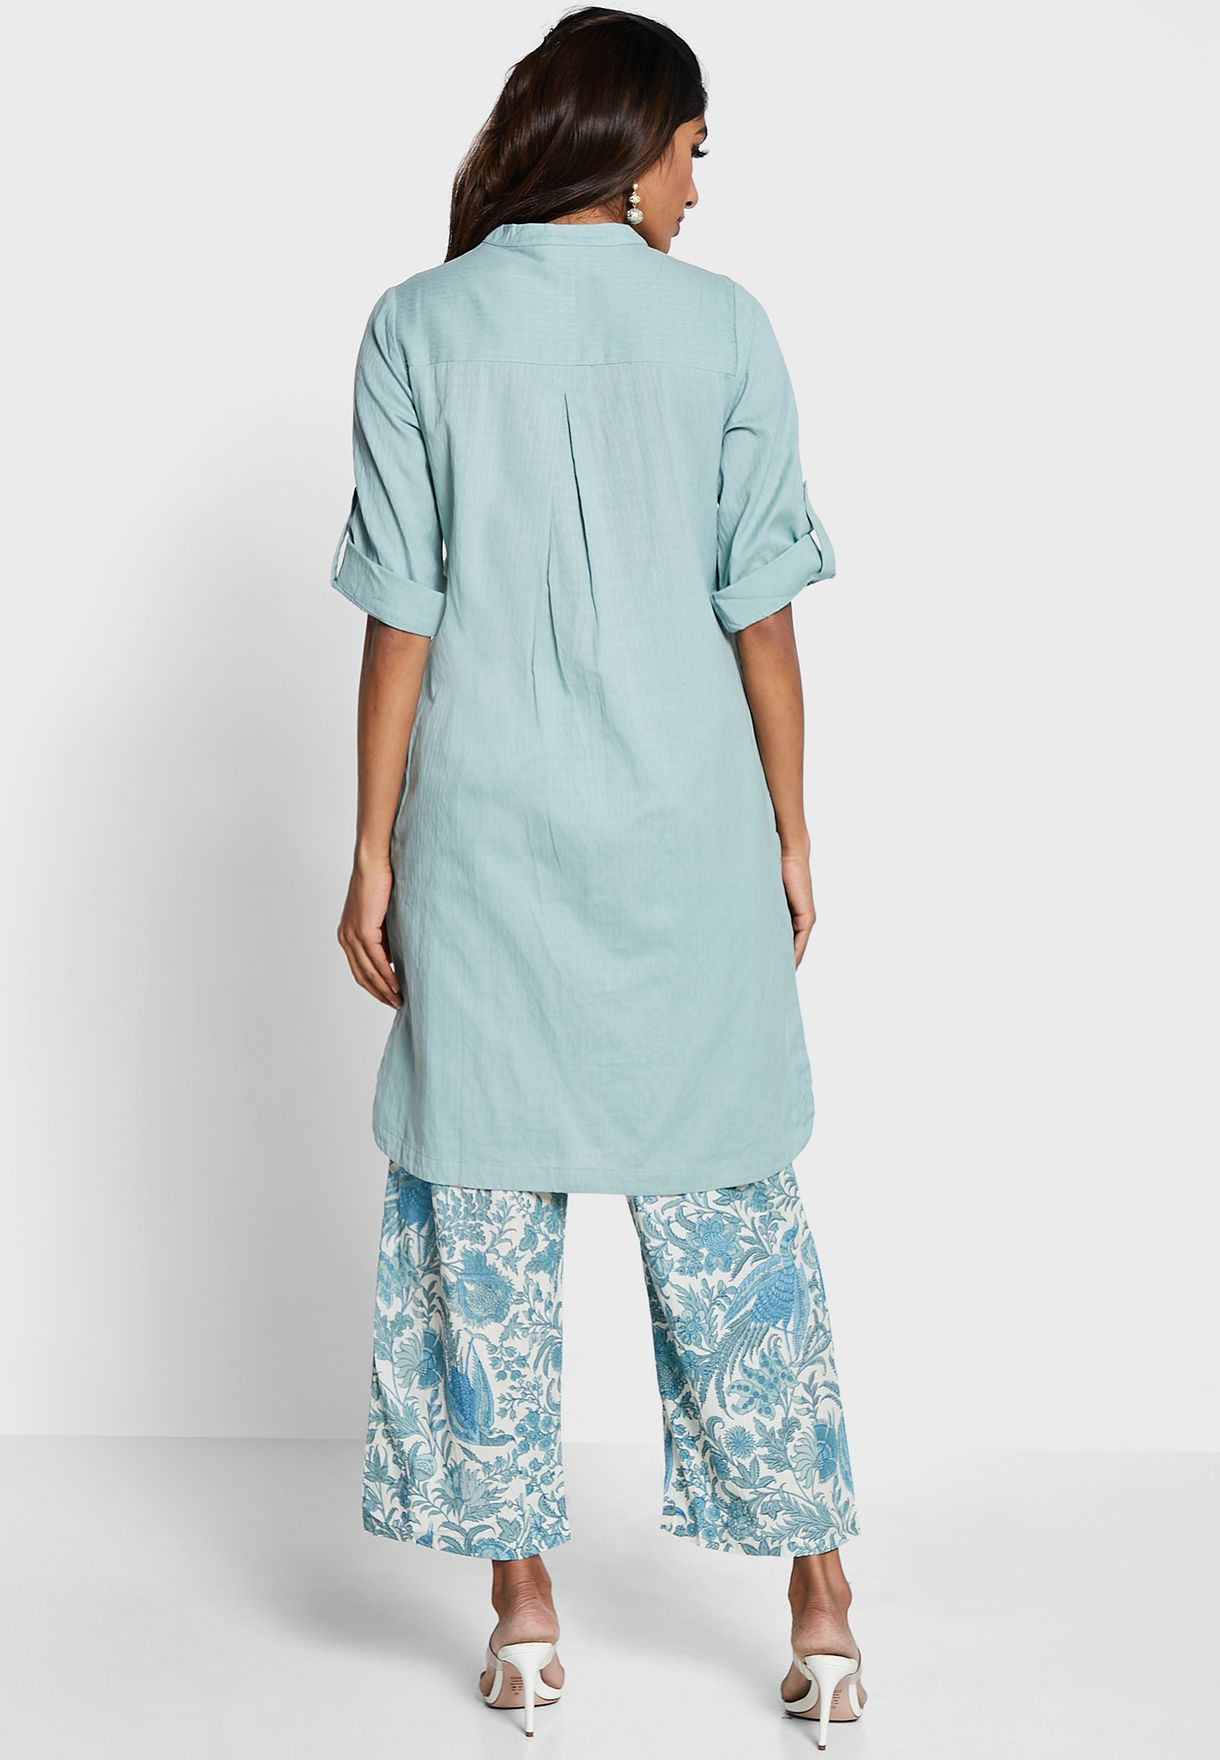 Embroidered 3/4 Sleeve Kurti With Printed Pants